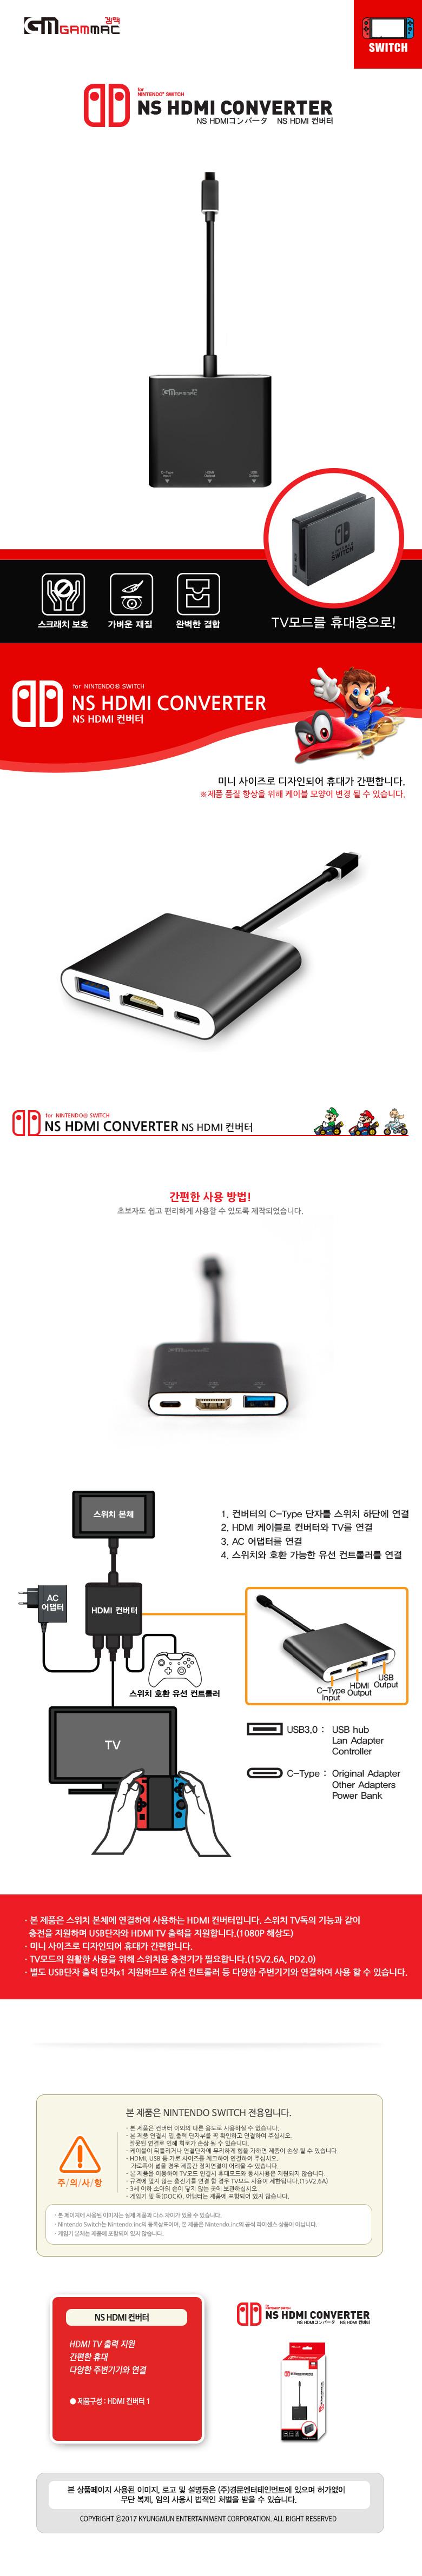 hdmi_converter.jpg